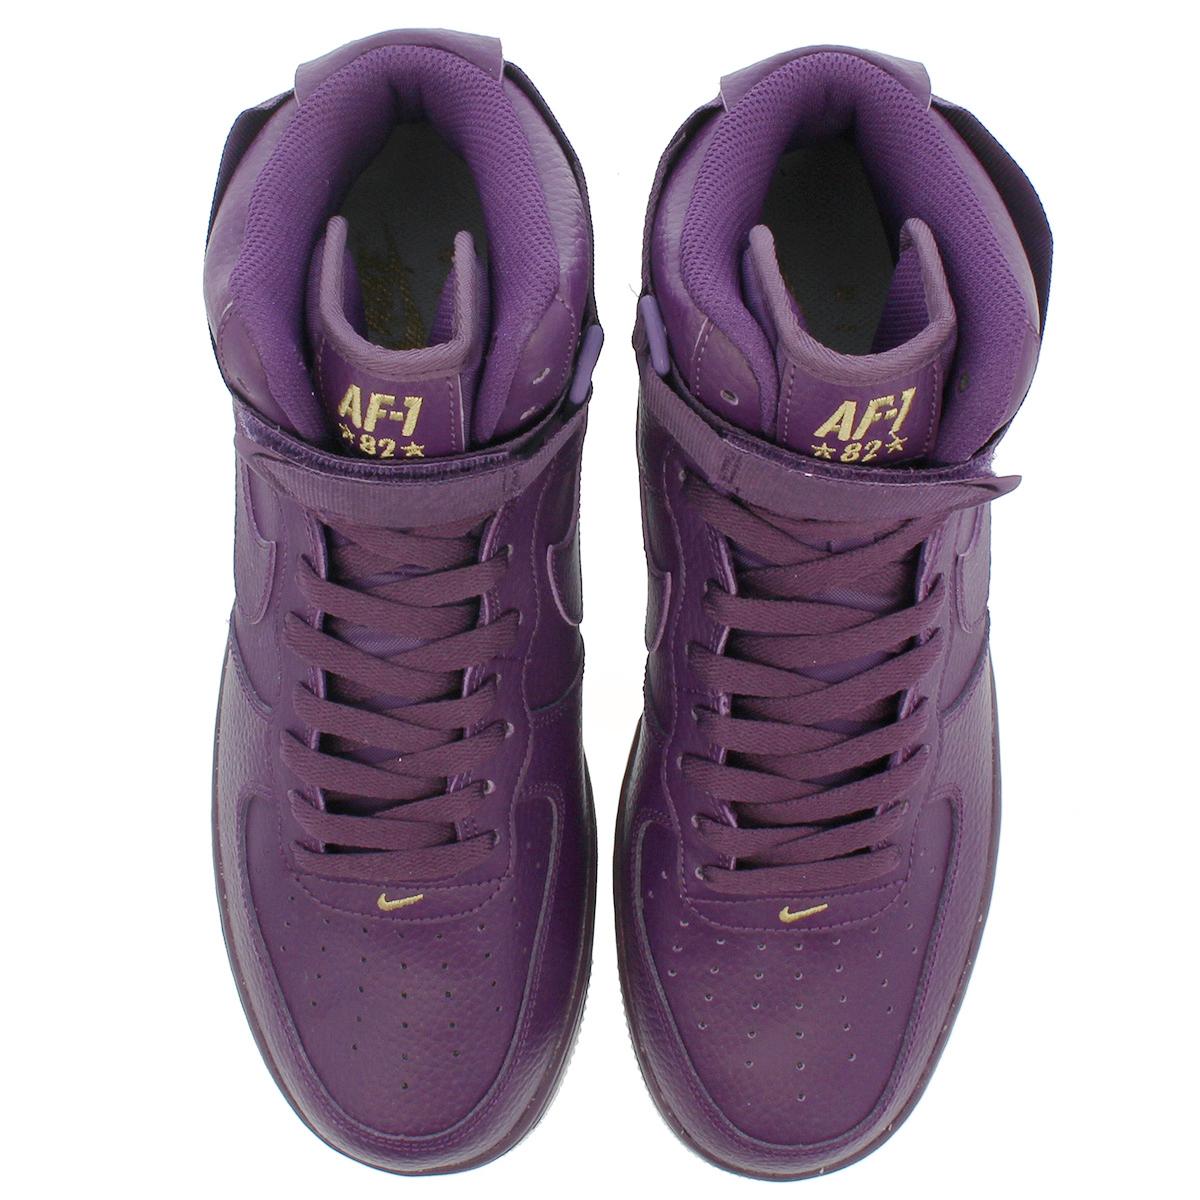 3ac2d43af08 NIKE AIR FORCE 1 HIGH 07 Nike air force 1 high 07 NIGHT PURPLE SUMMIT WHITE METALLIC  GOLD 315